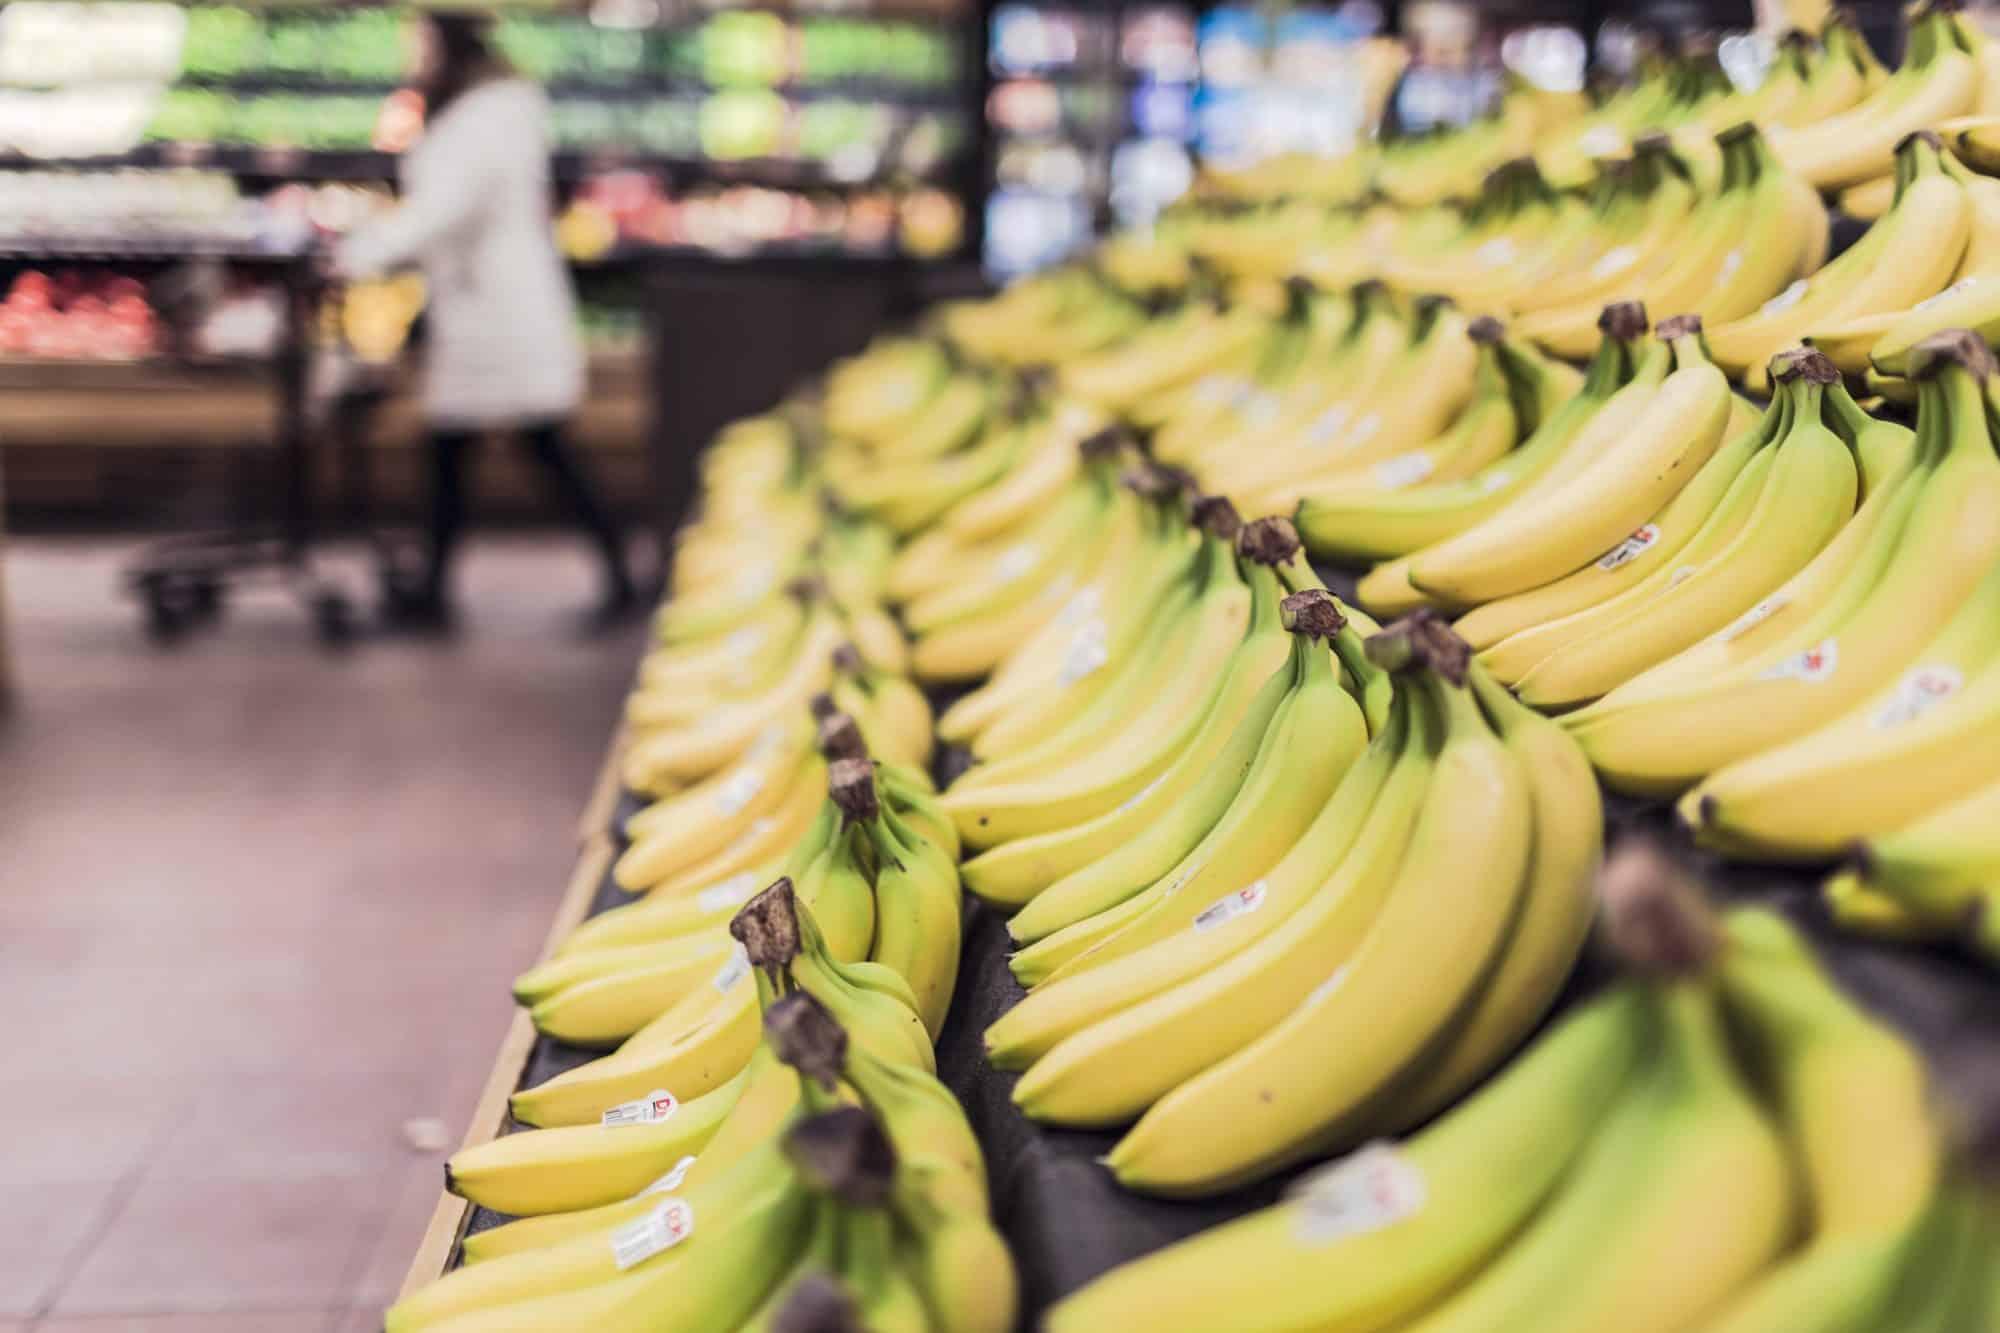 Is the EU School Fruit Scheme the healthy option?